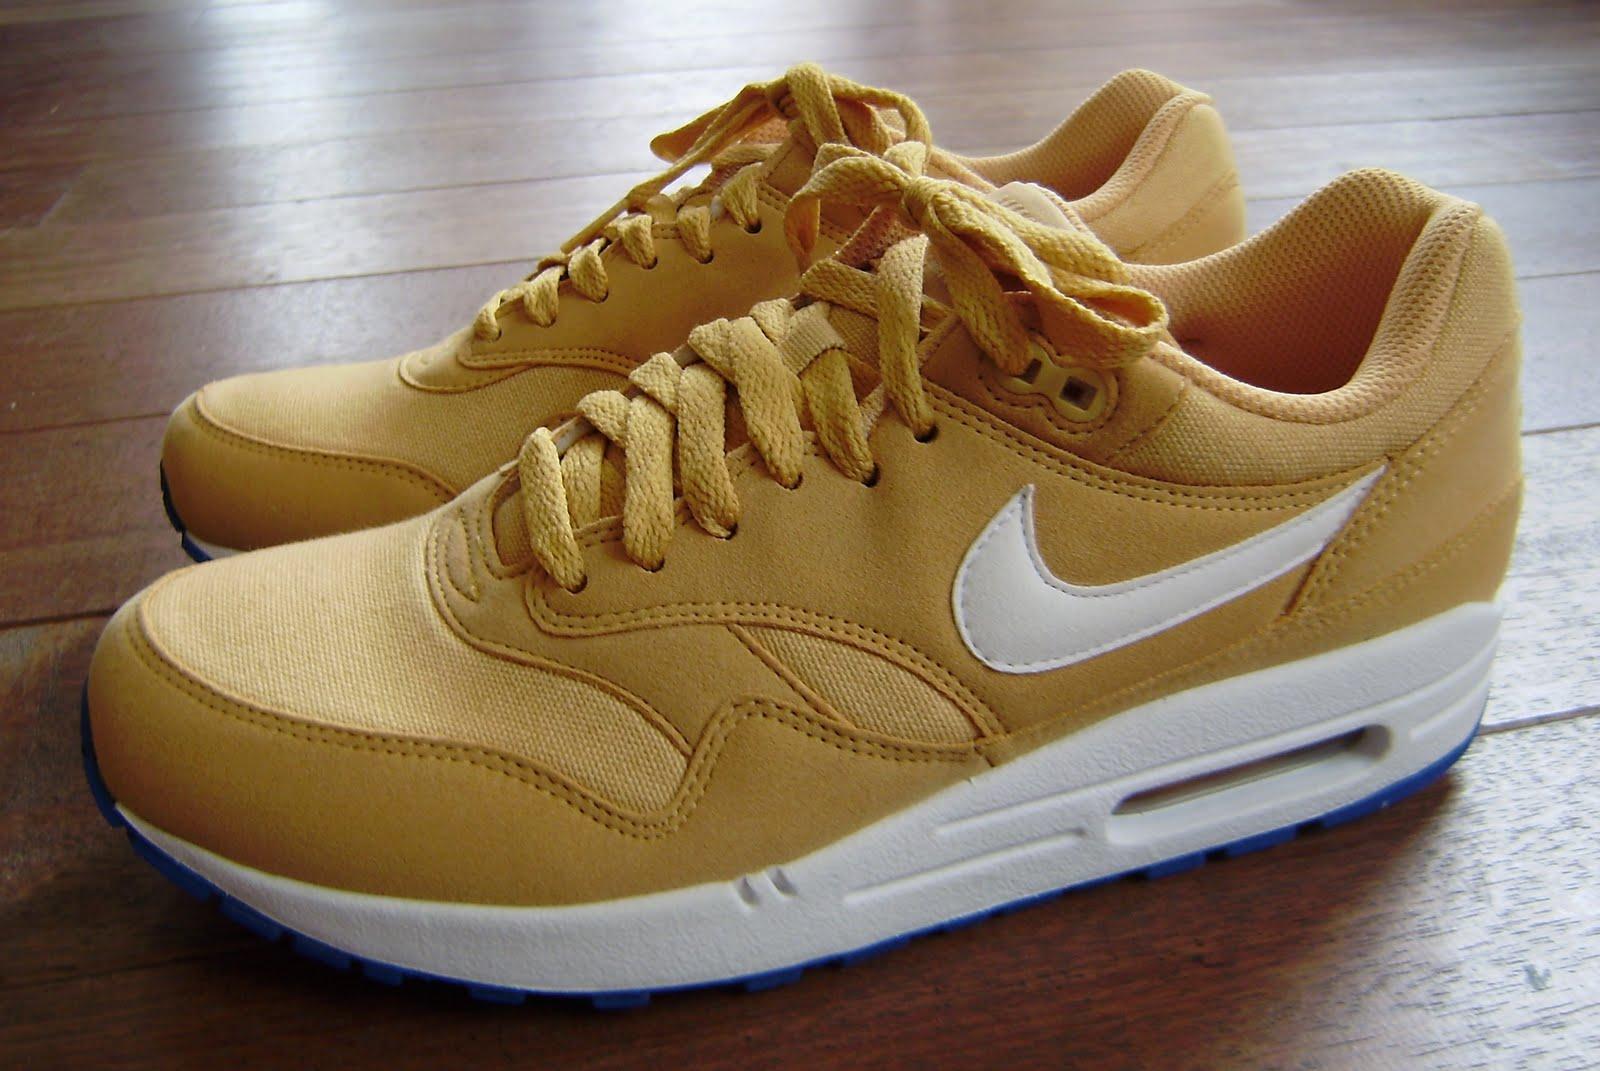 69d9f6eb0d Nike air max 1 Honeycomb 308866 700 6 US => 13 US